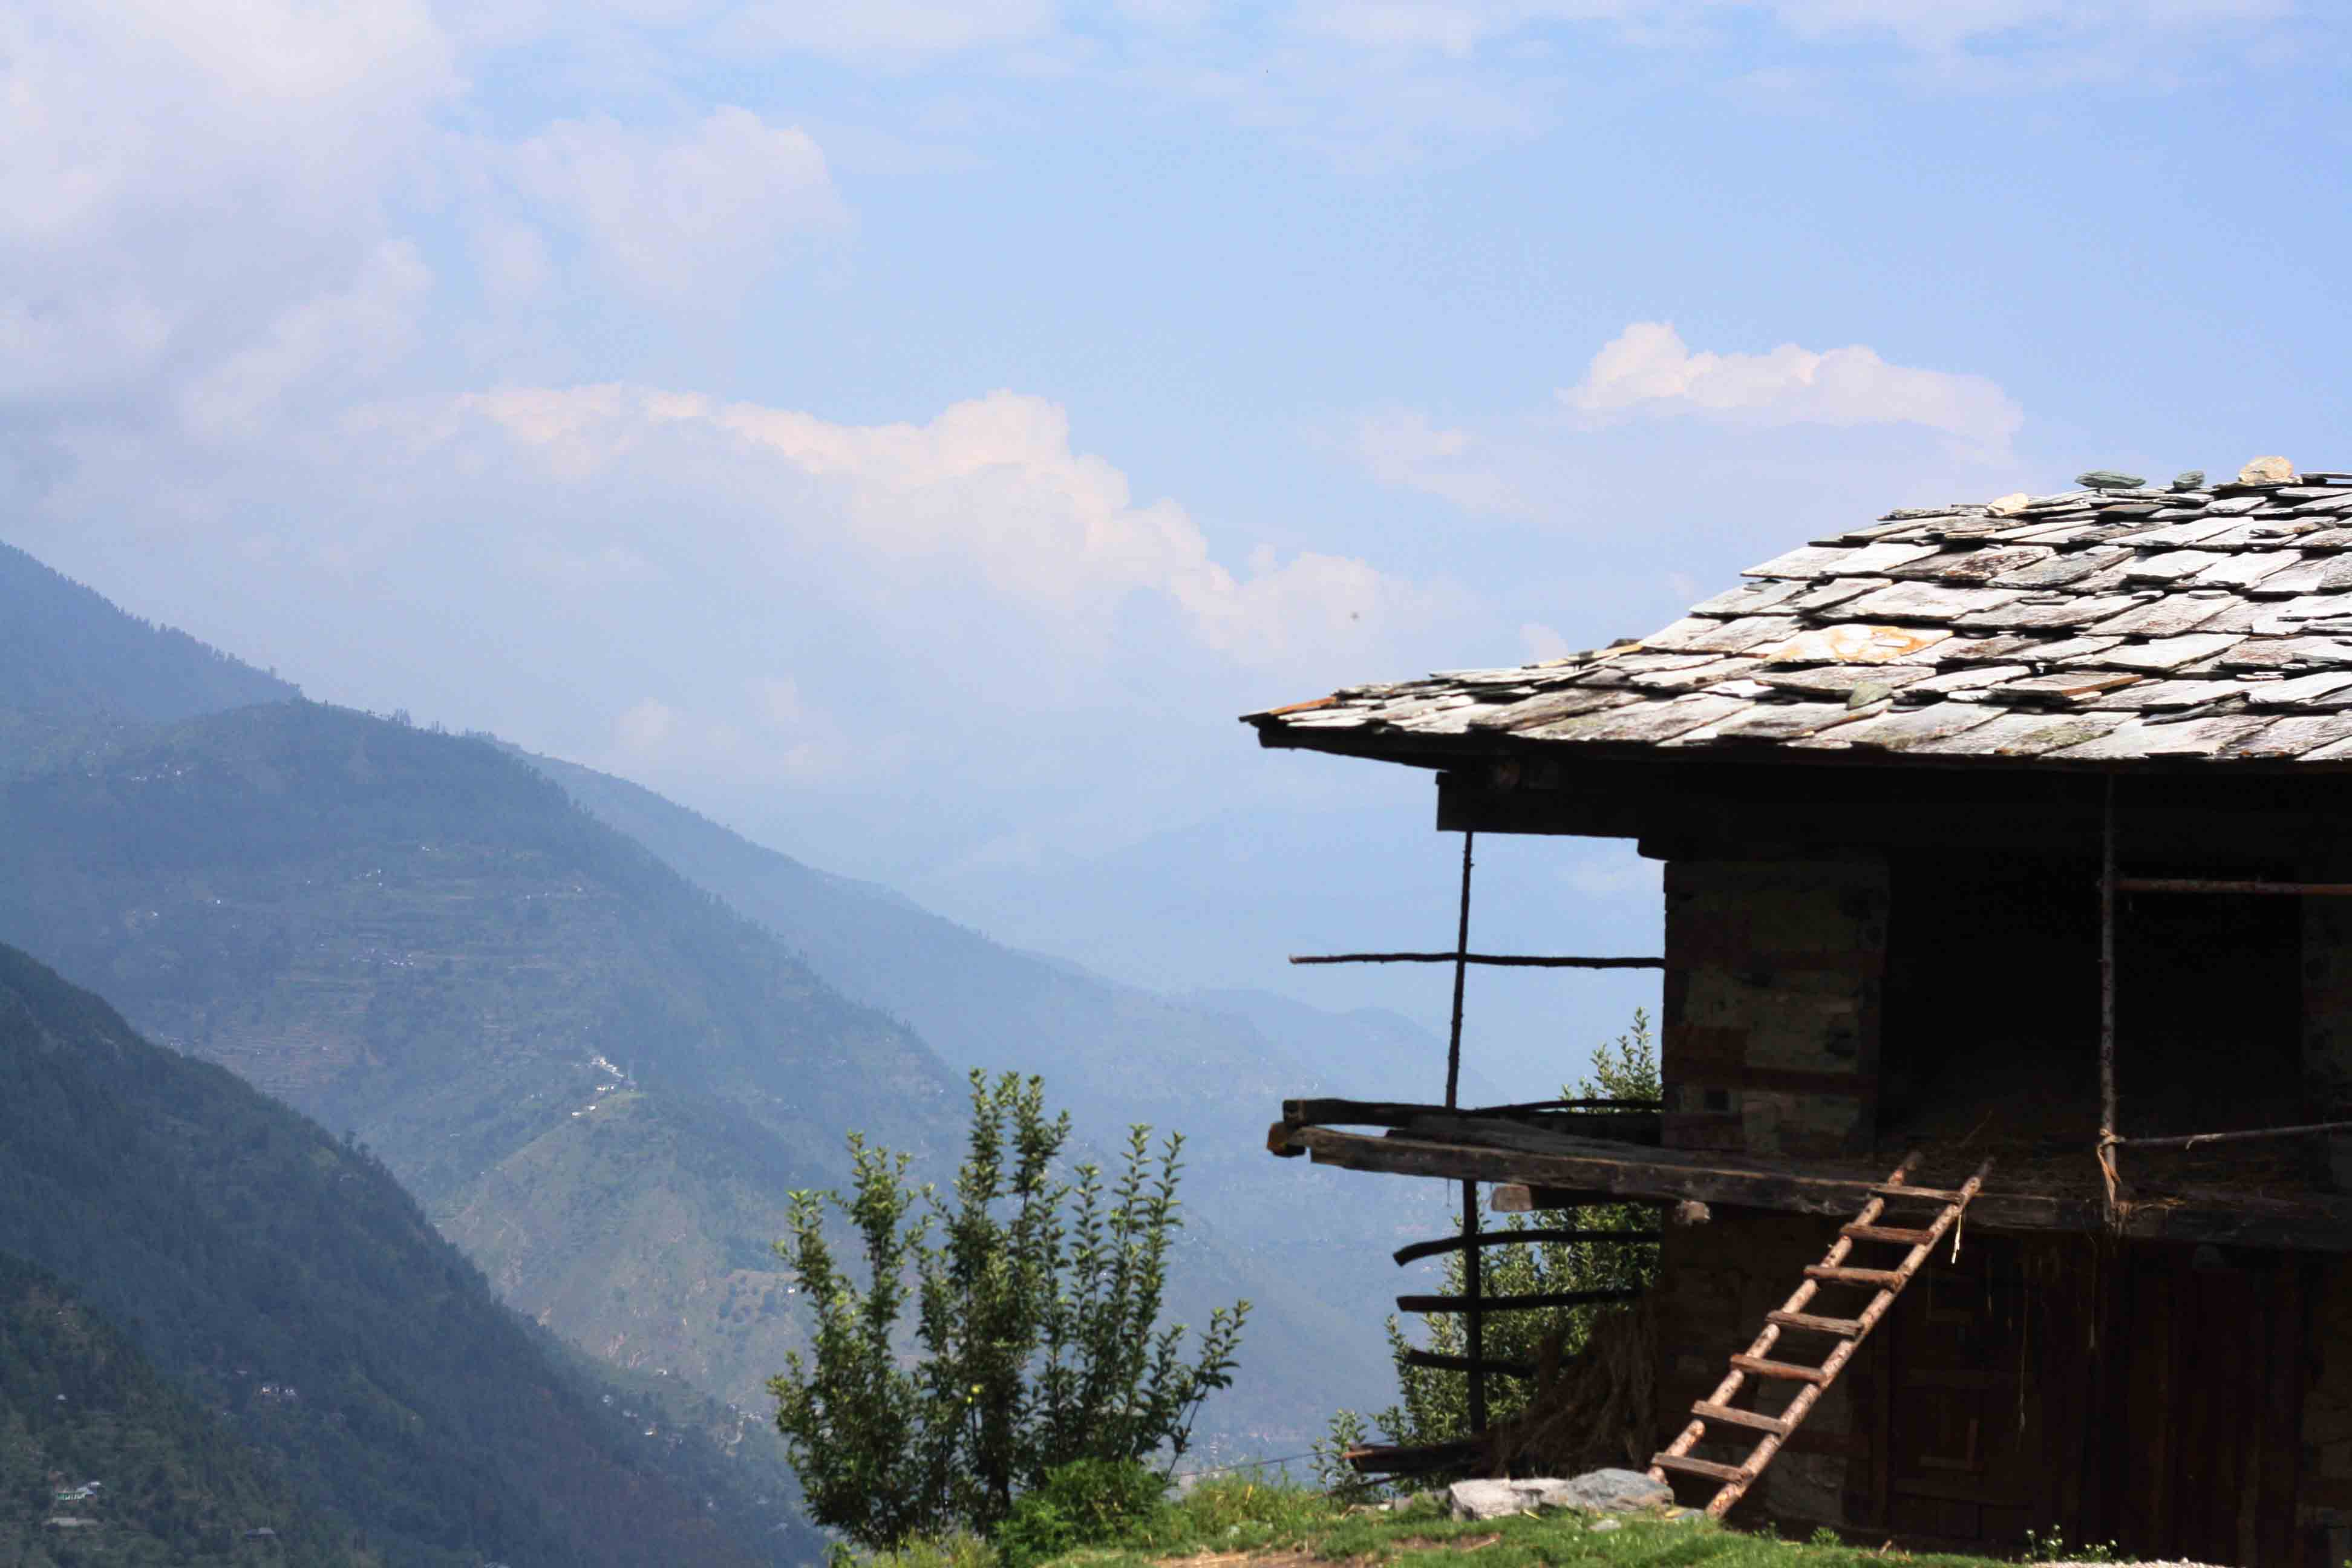 City Travel - Pekhari Village, Great Himalayan National Park